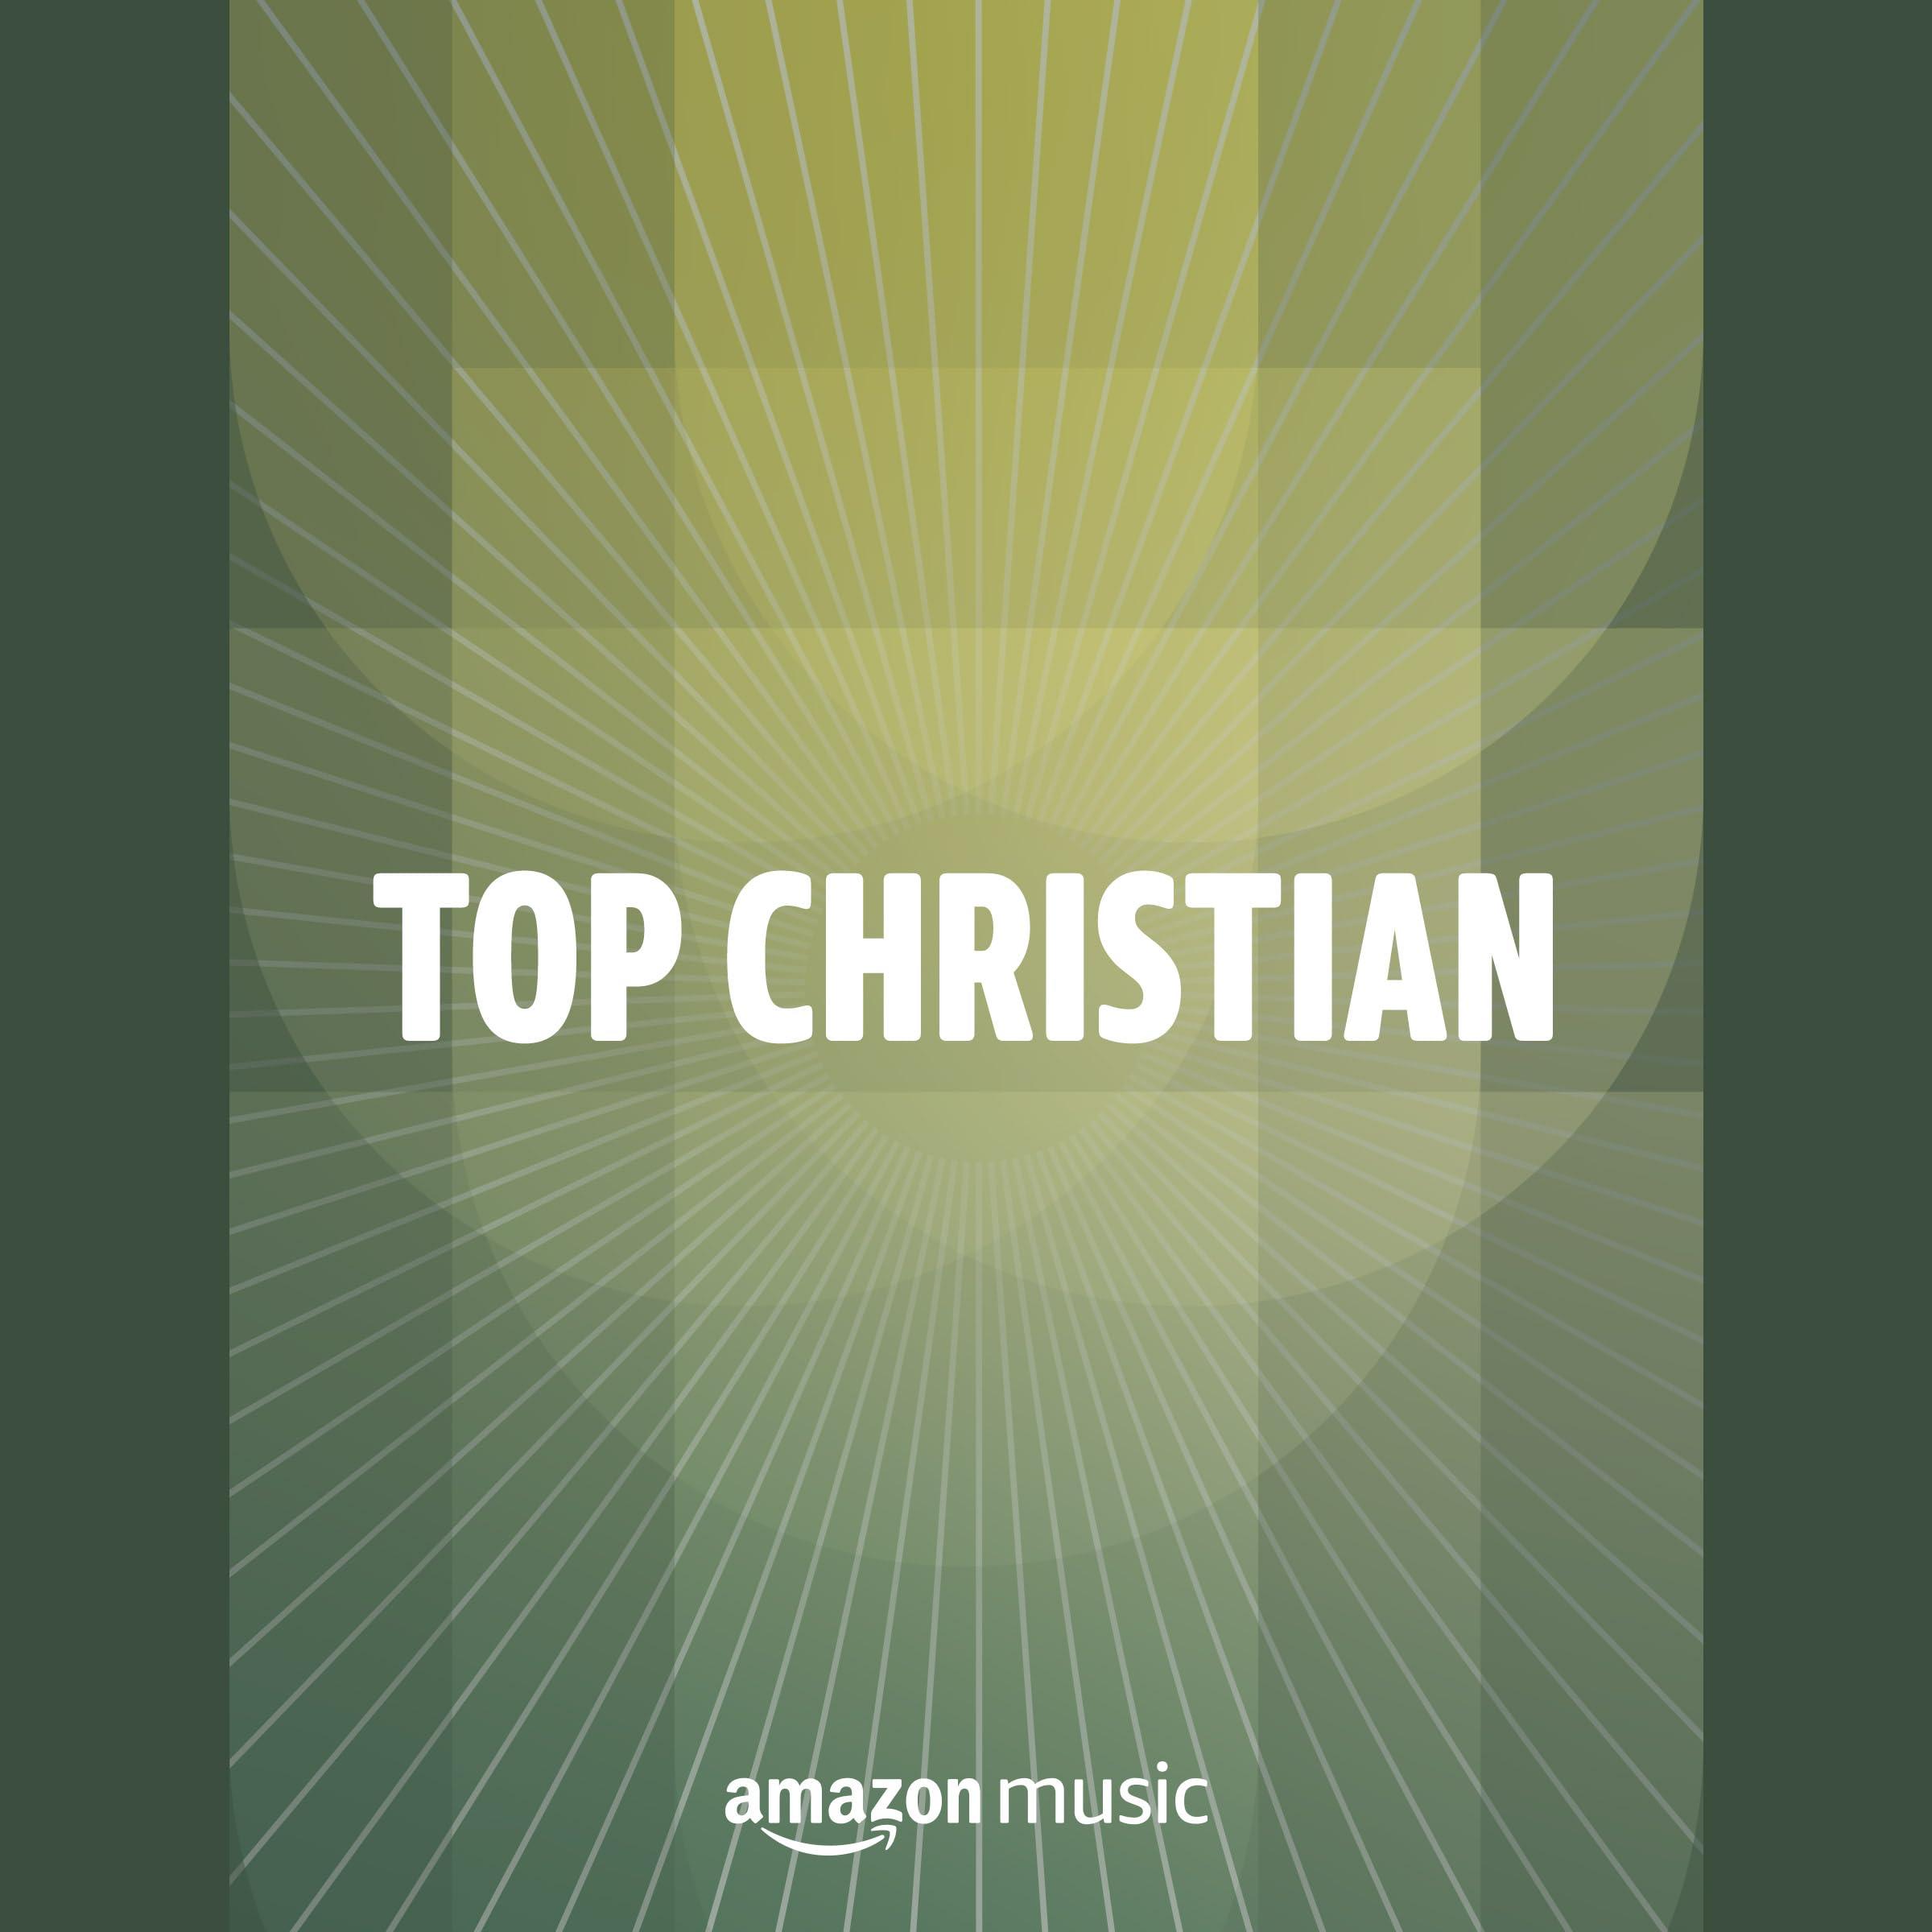 Top Christian